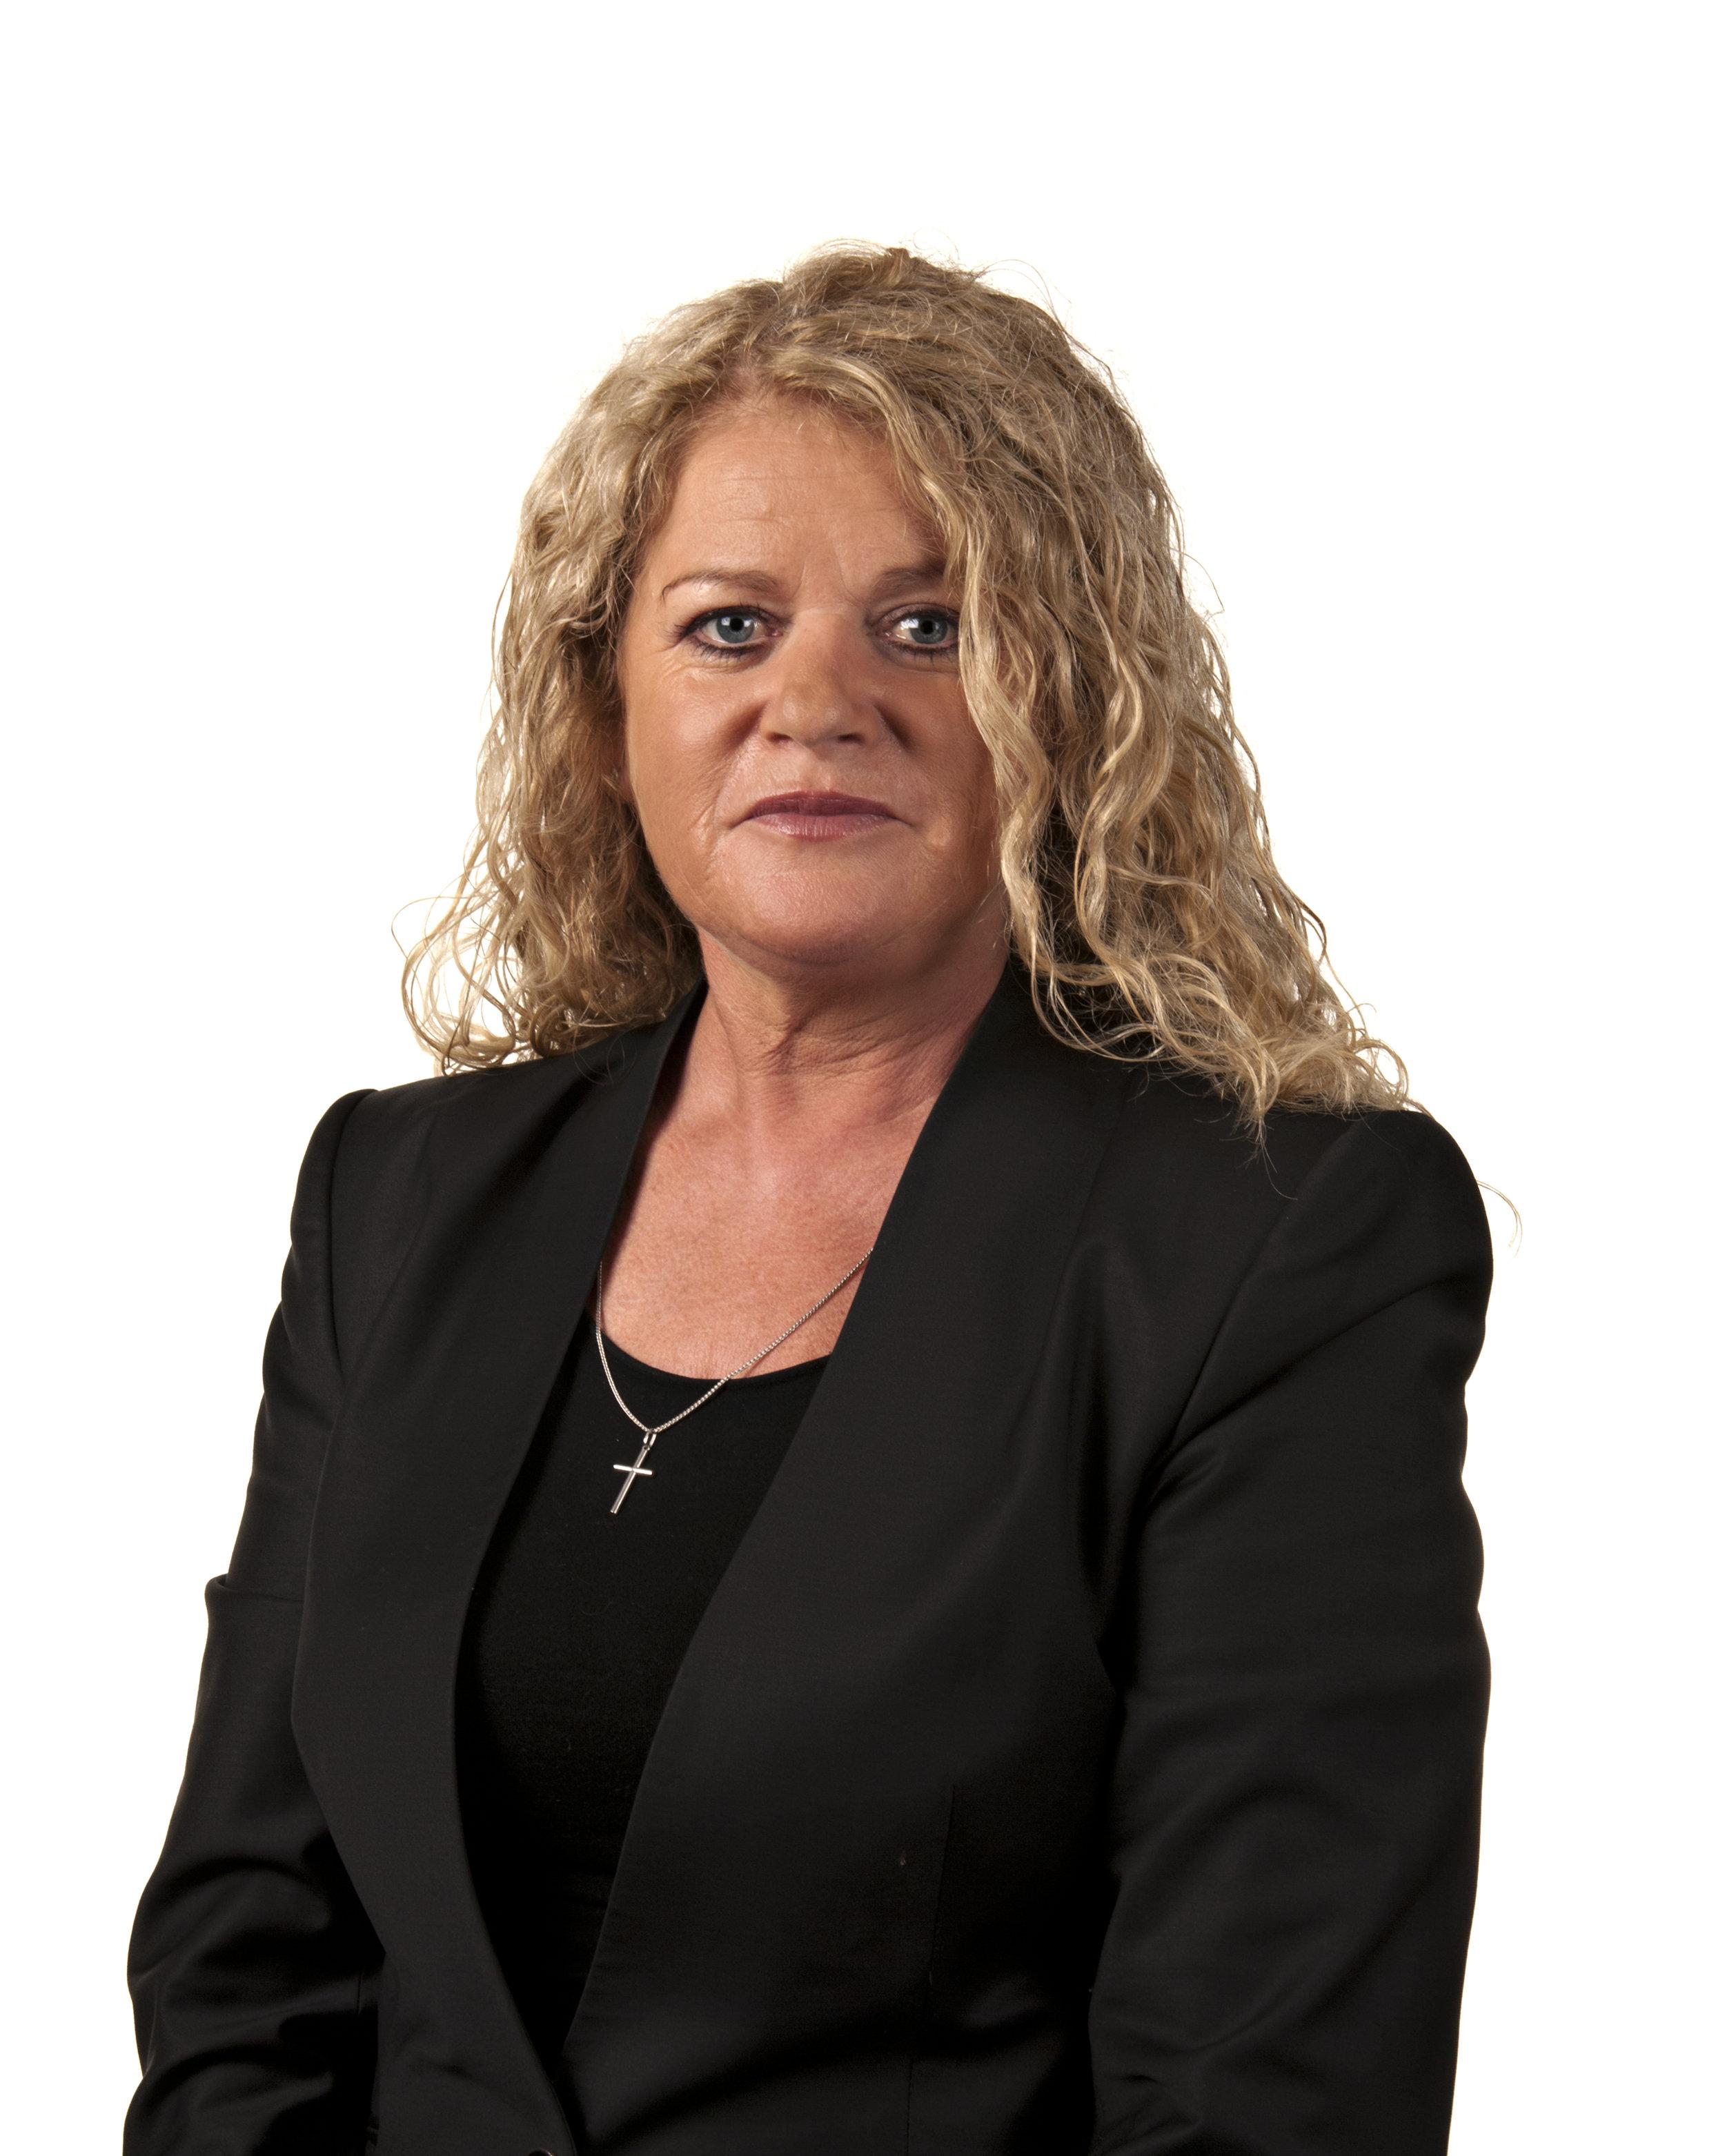 Paula Fitzpatrick